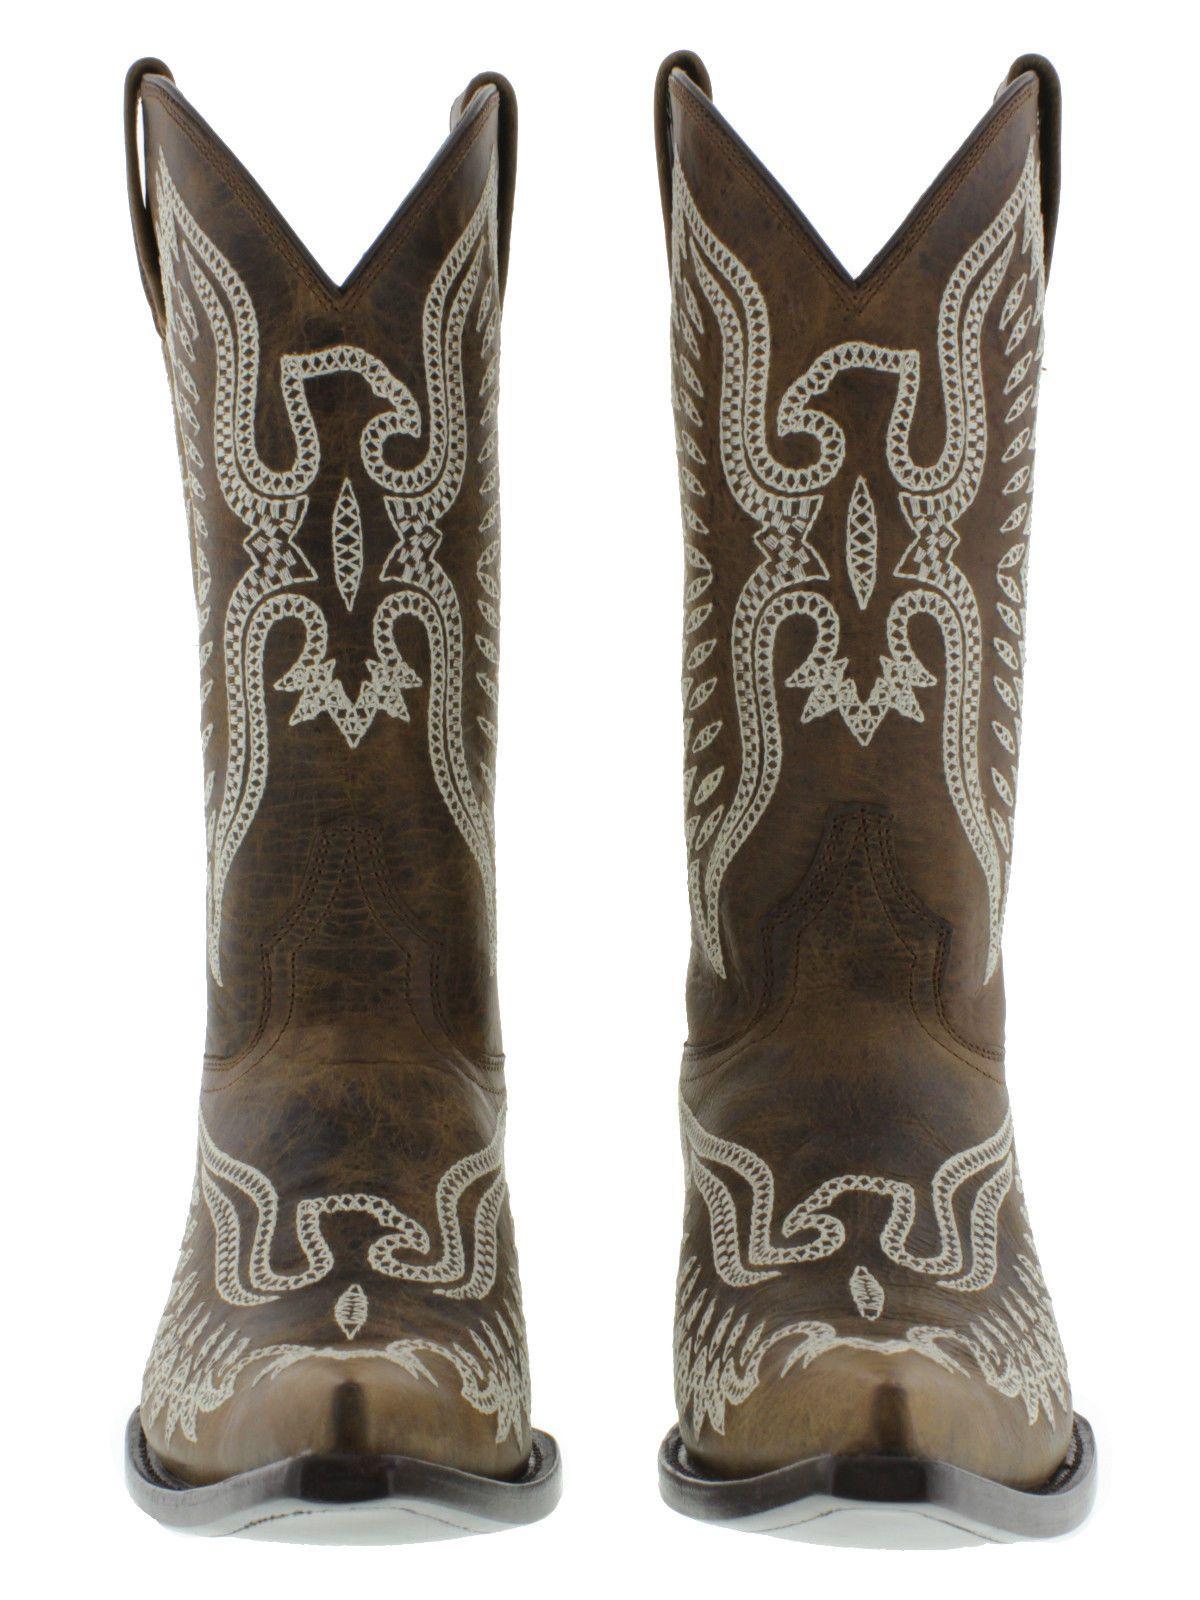 Men's cowboy boots brown leather western biker rodeo phoenix eagle motorcycle